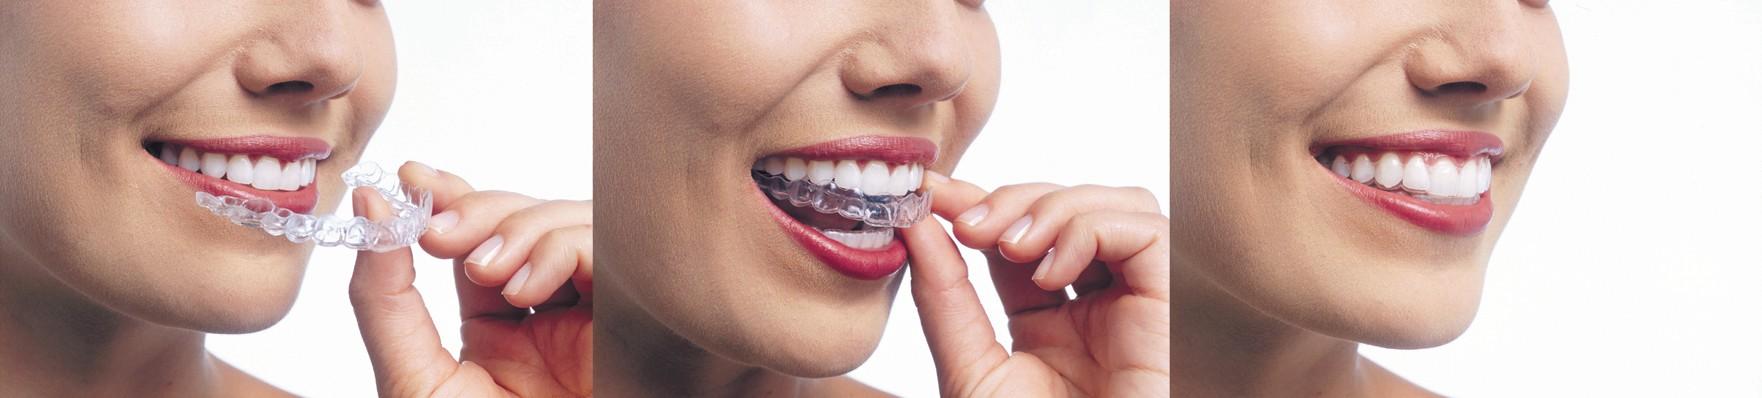 Invisalign Dentist Woodbridge VA